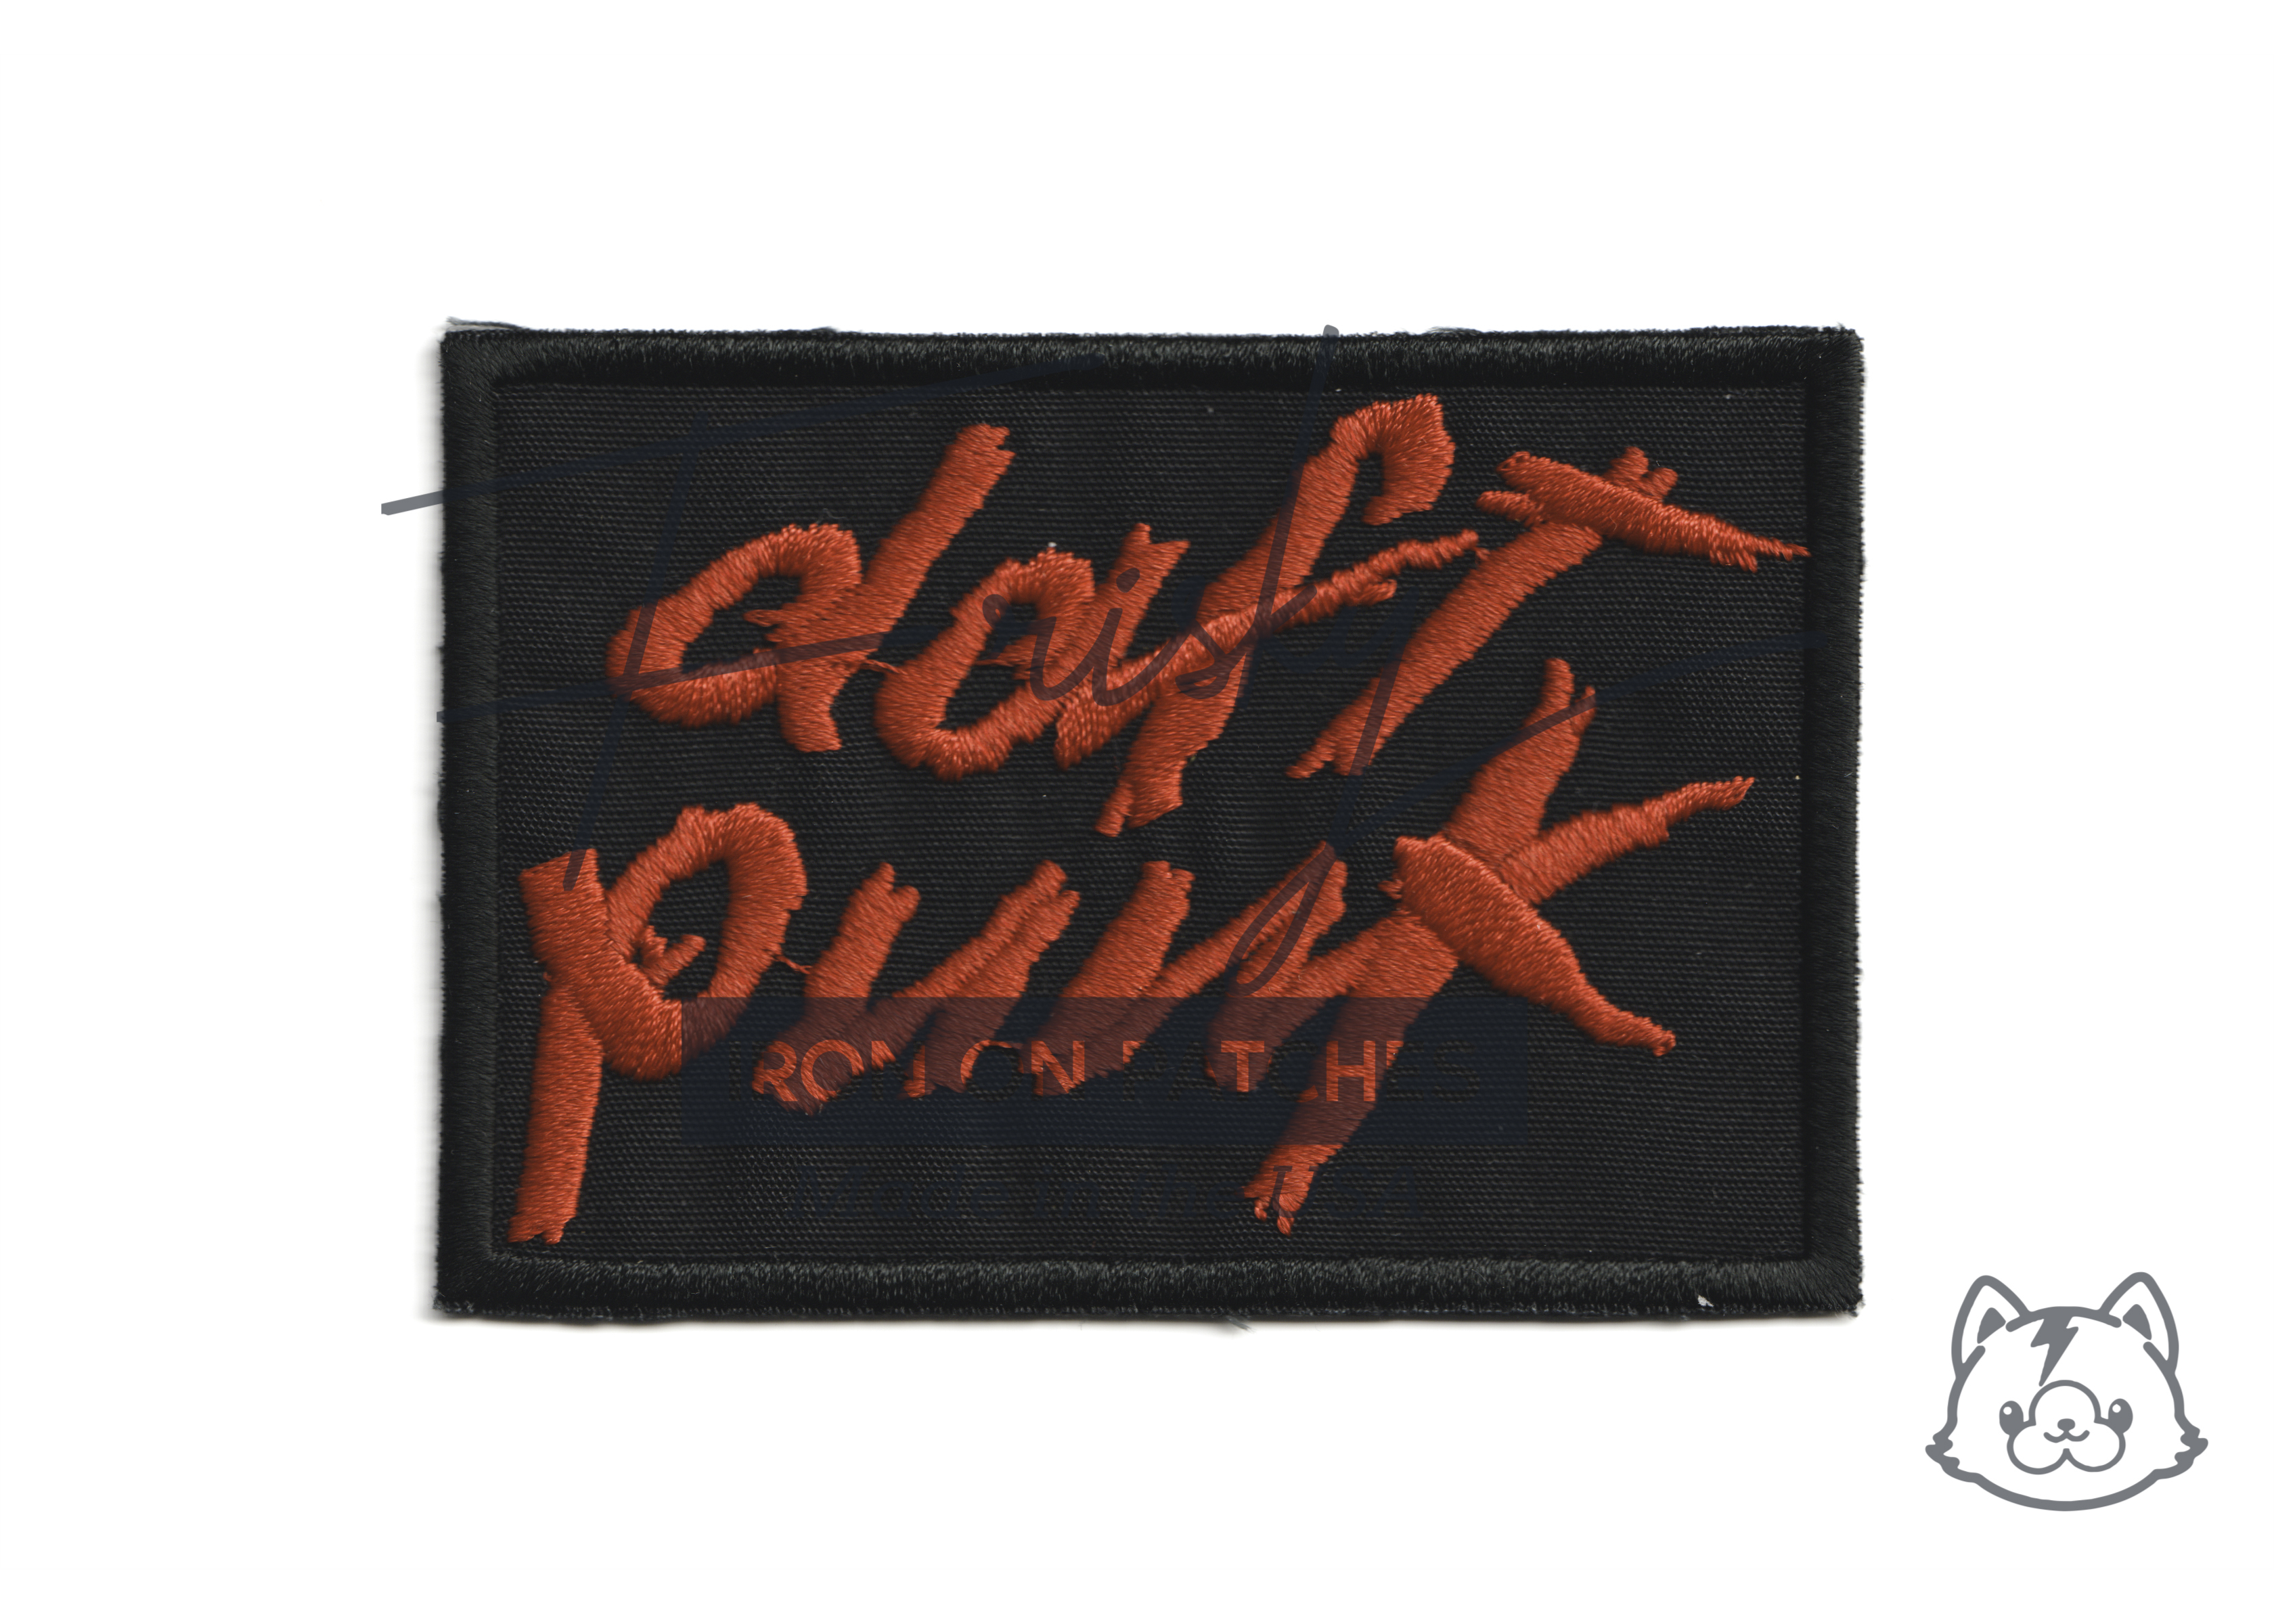 Daft Punk Iron On Patch